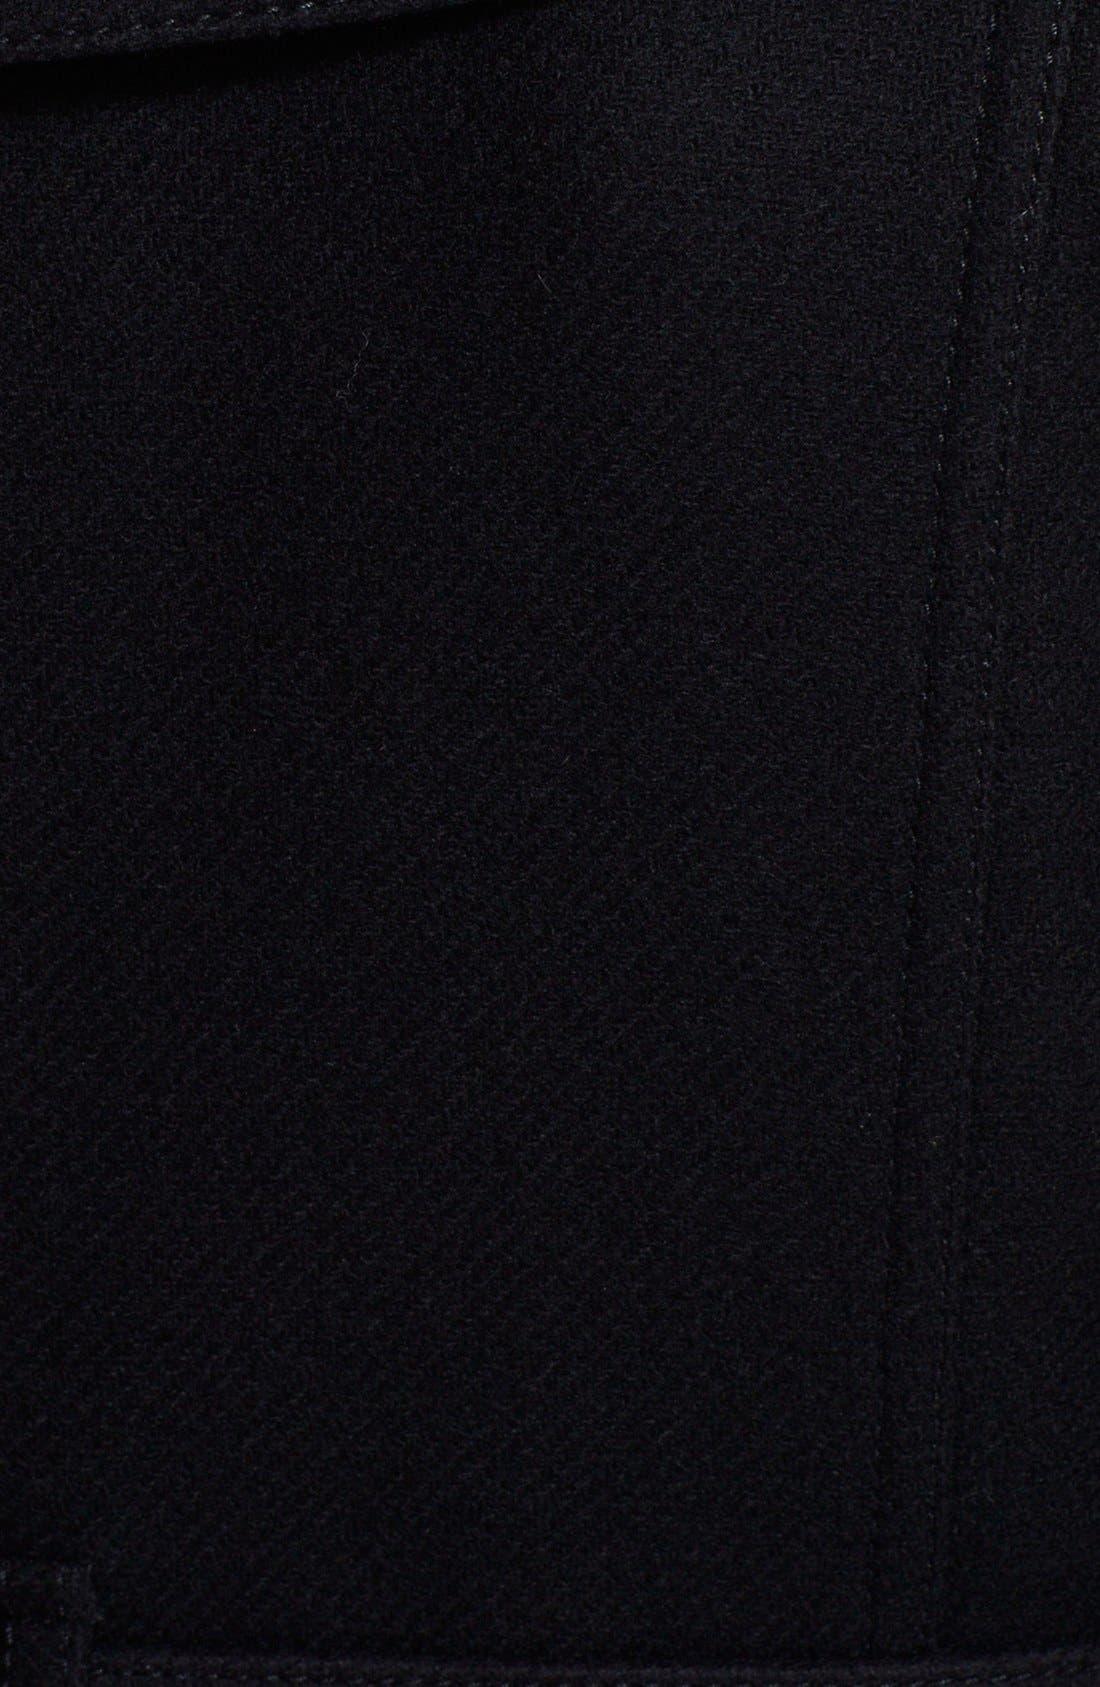 Alternate Image 3  - Burberry Brit 'Rushfield' Wool Blend Single Breasted Coat